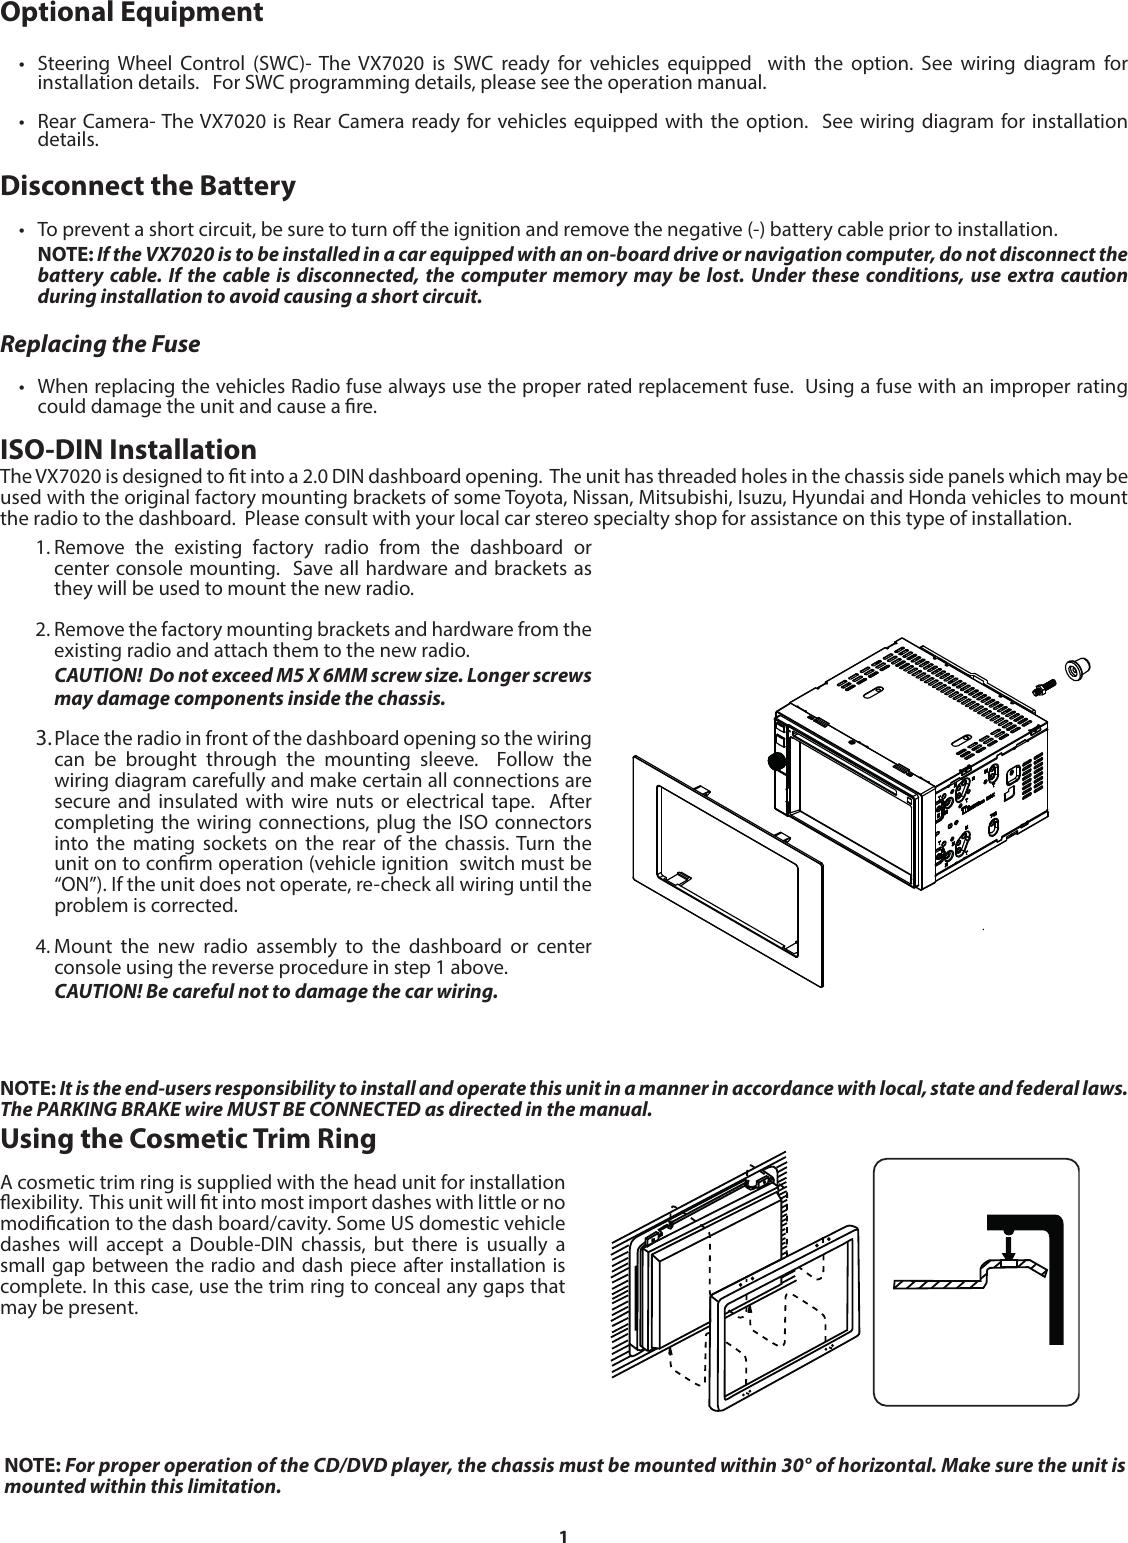 audiovox vx7020 installation manual 128 9293 guide 03 25 14 on prestige  remote car starter diagram